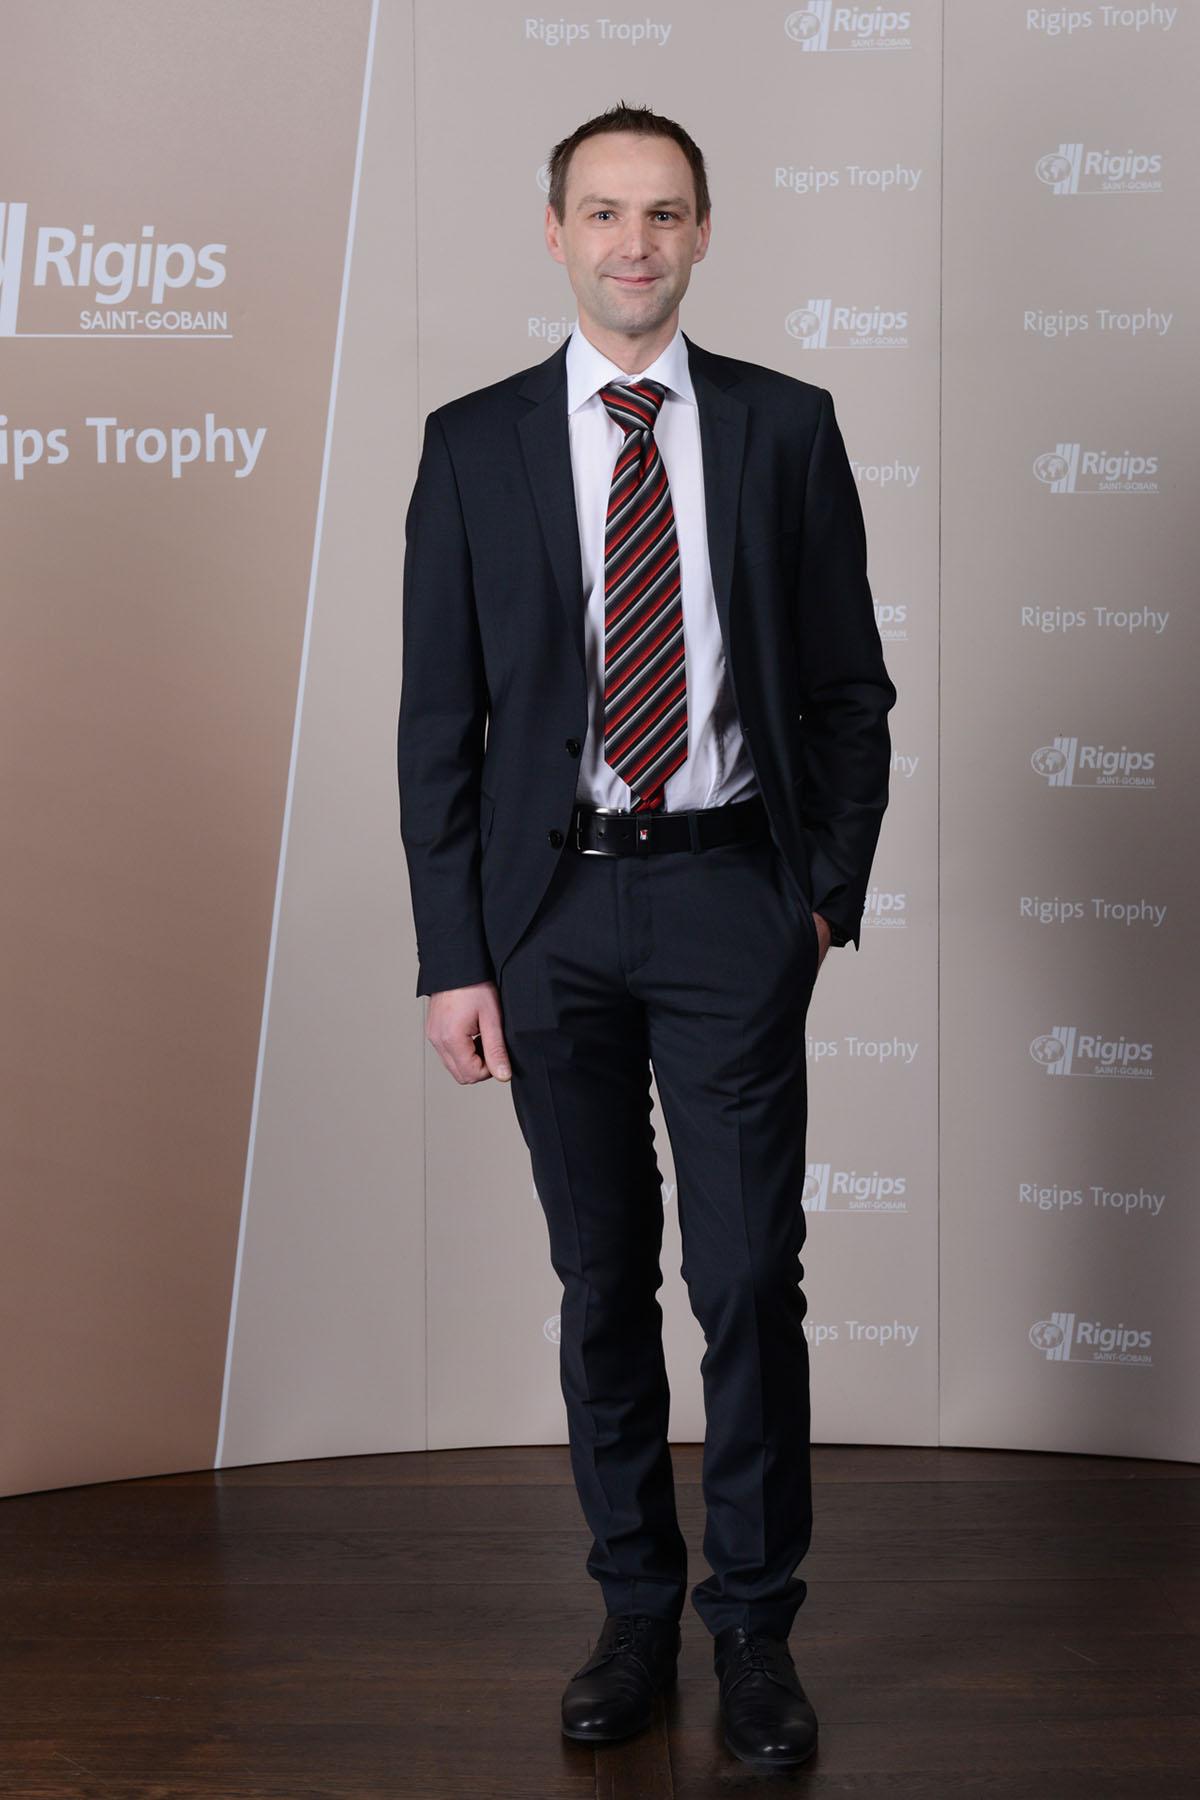 Rigips Trophy 16_0087